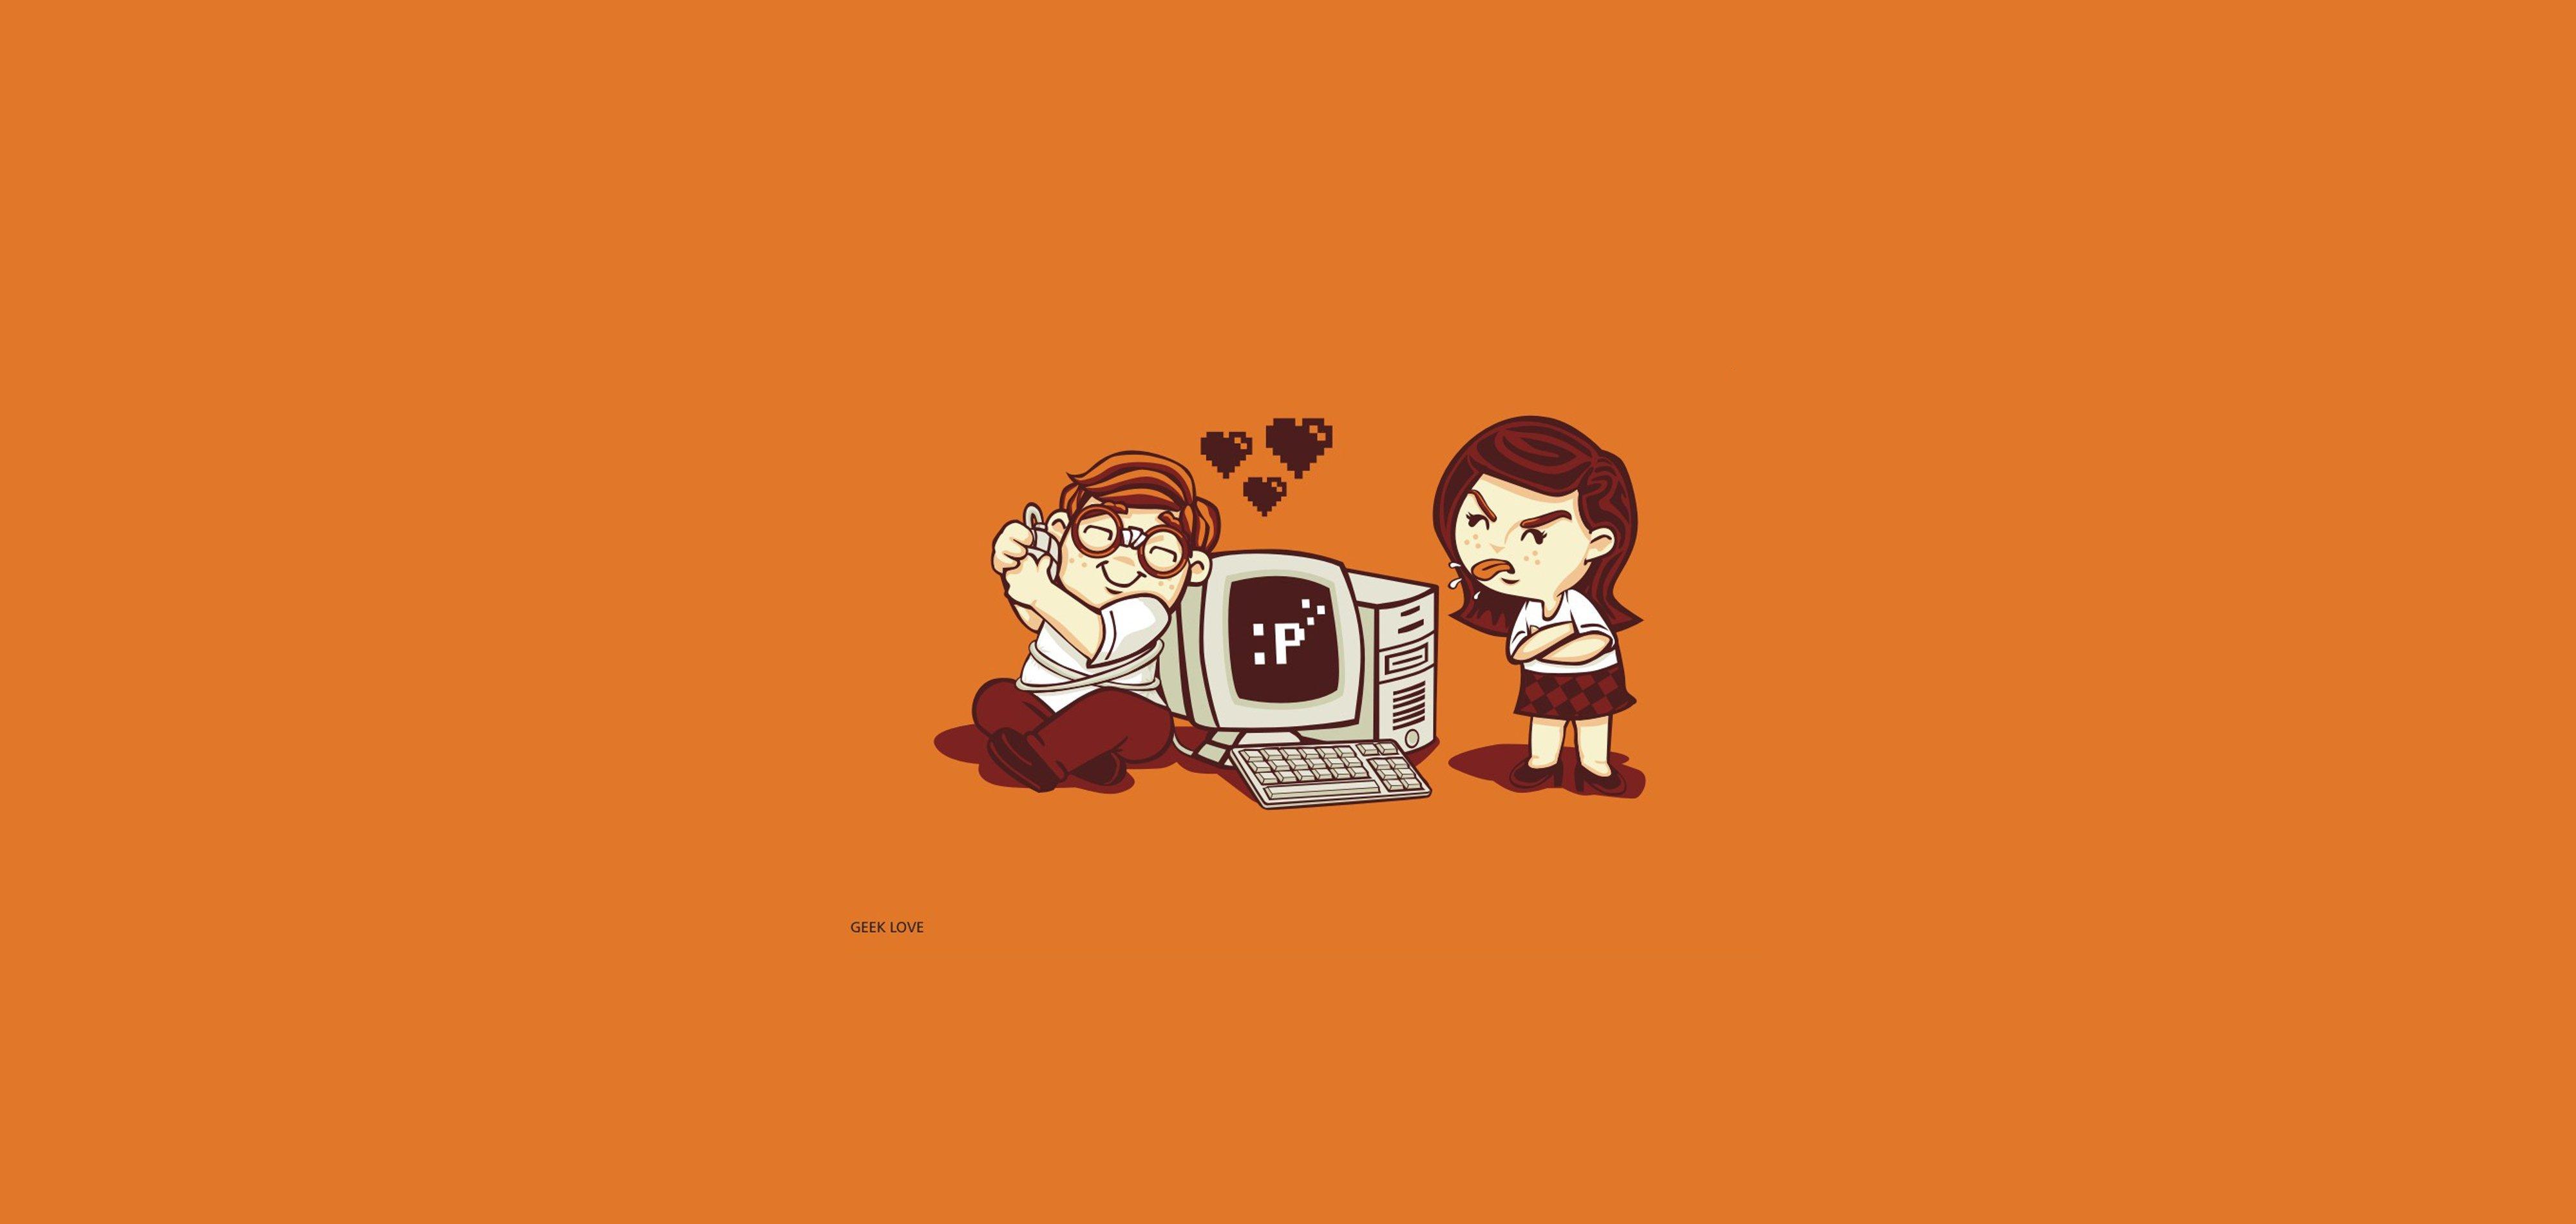 #geeklove. - Изображение 1